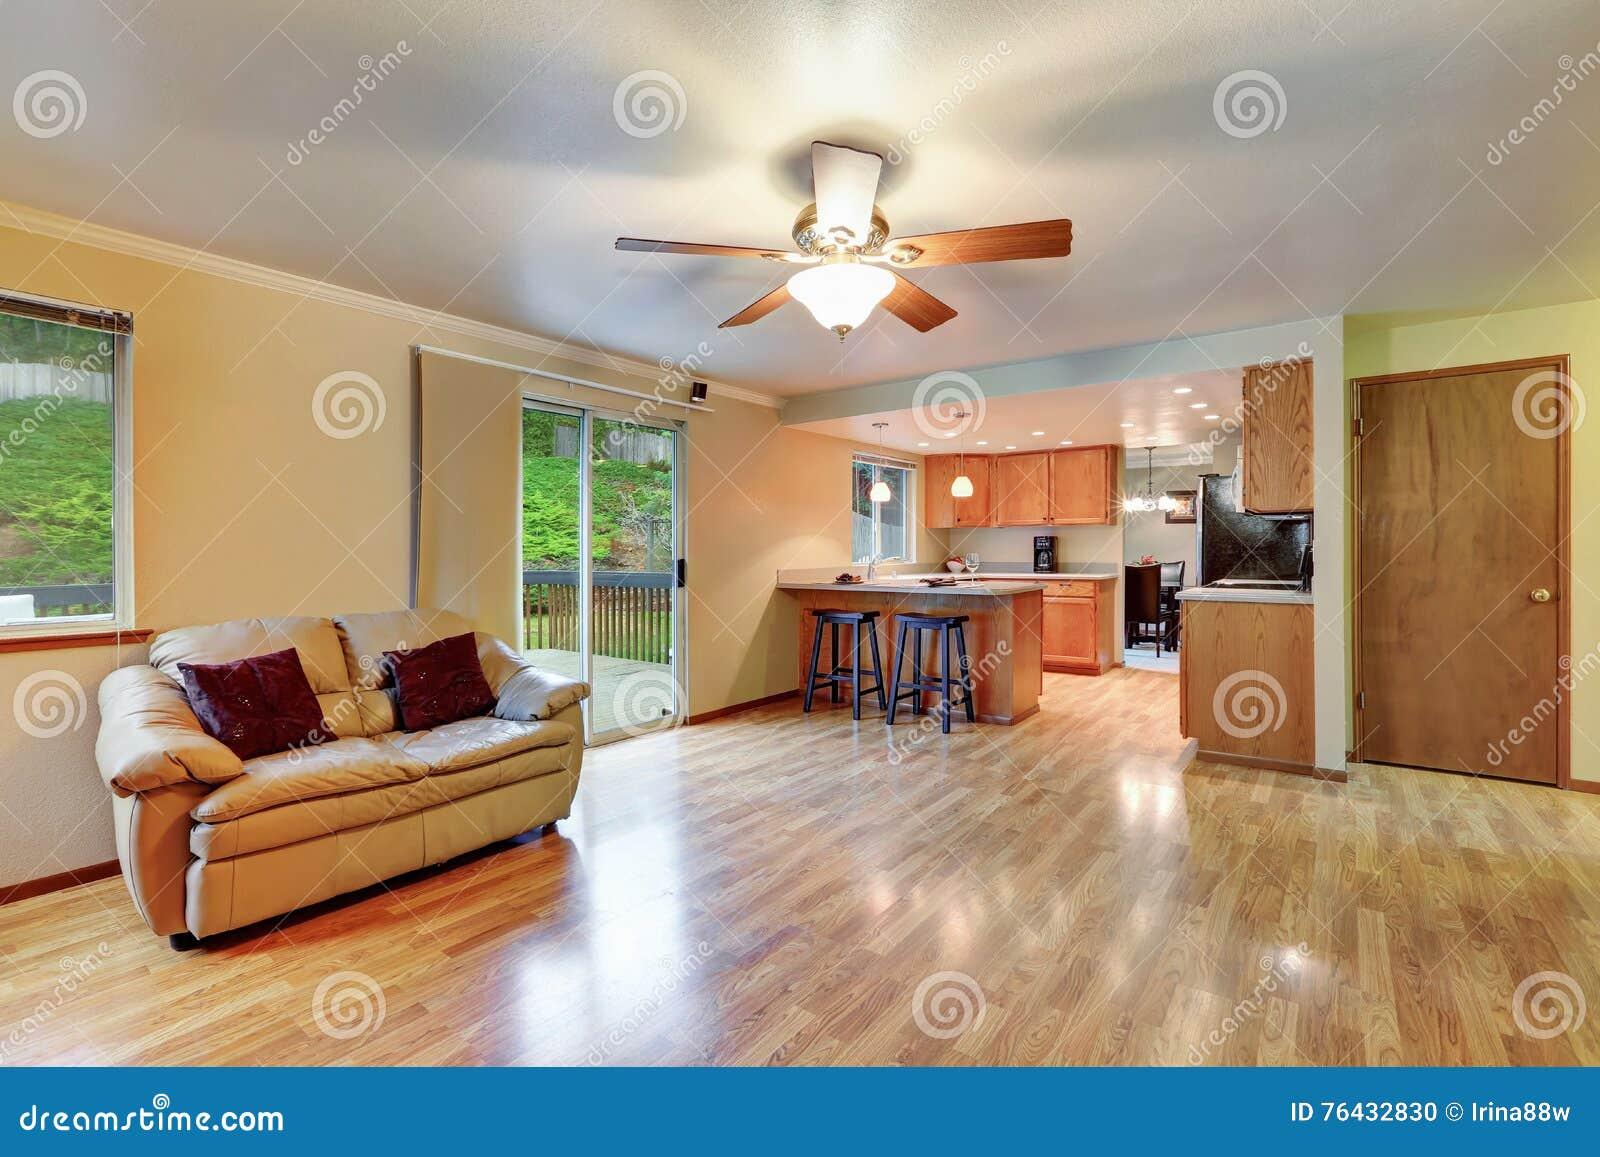 Cozy Hardwood Living Room With Open Floor Plan Stock Photo Image 76432830